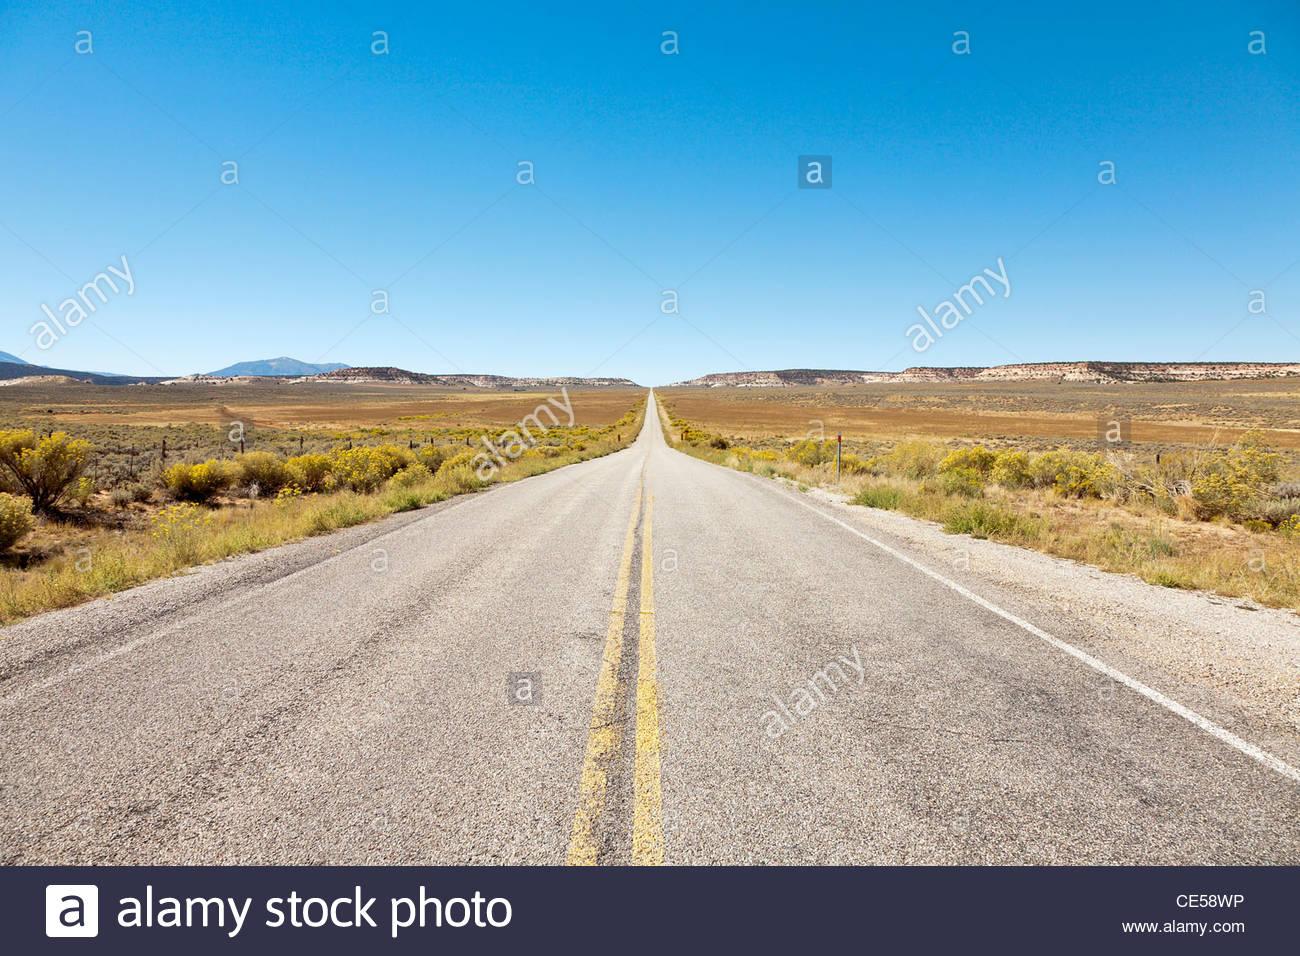 Long desert road, Utah Highway 211, near Canyonlands National Park, Colorado, United States - Stock Image